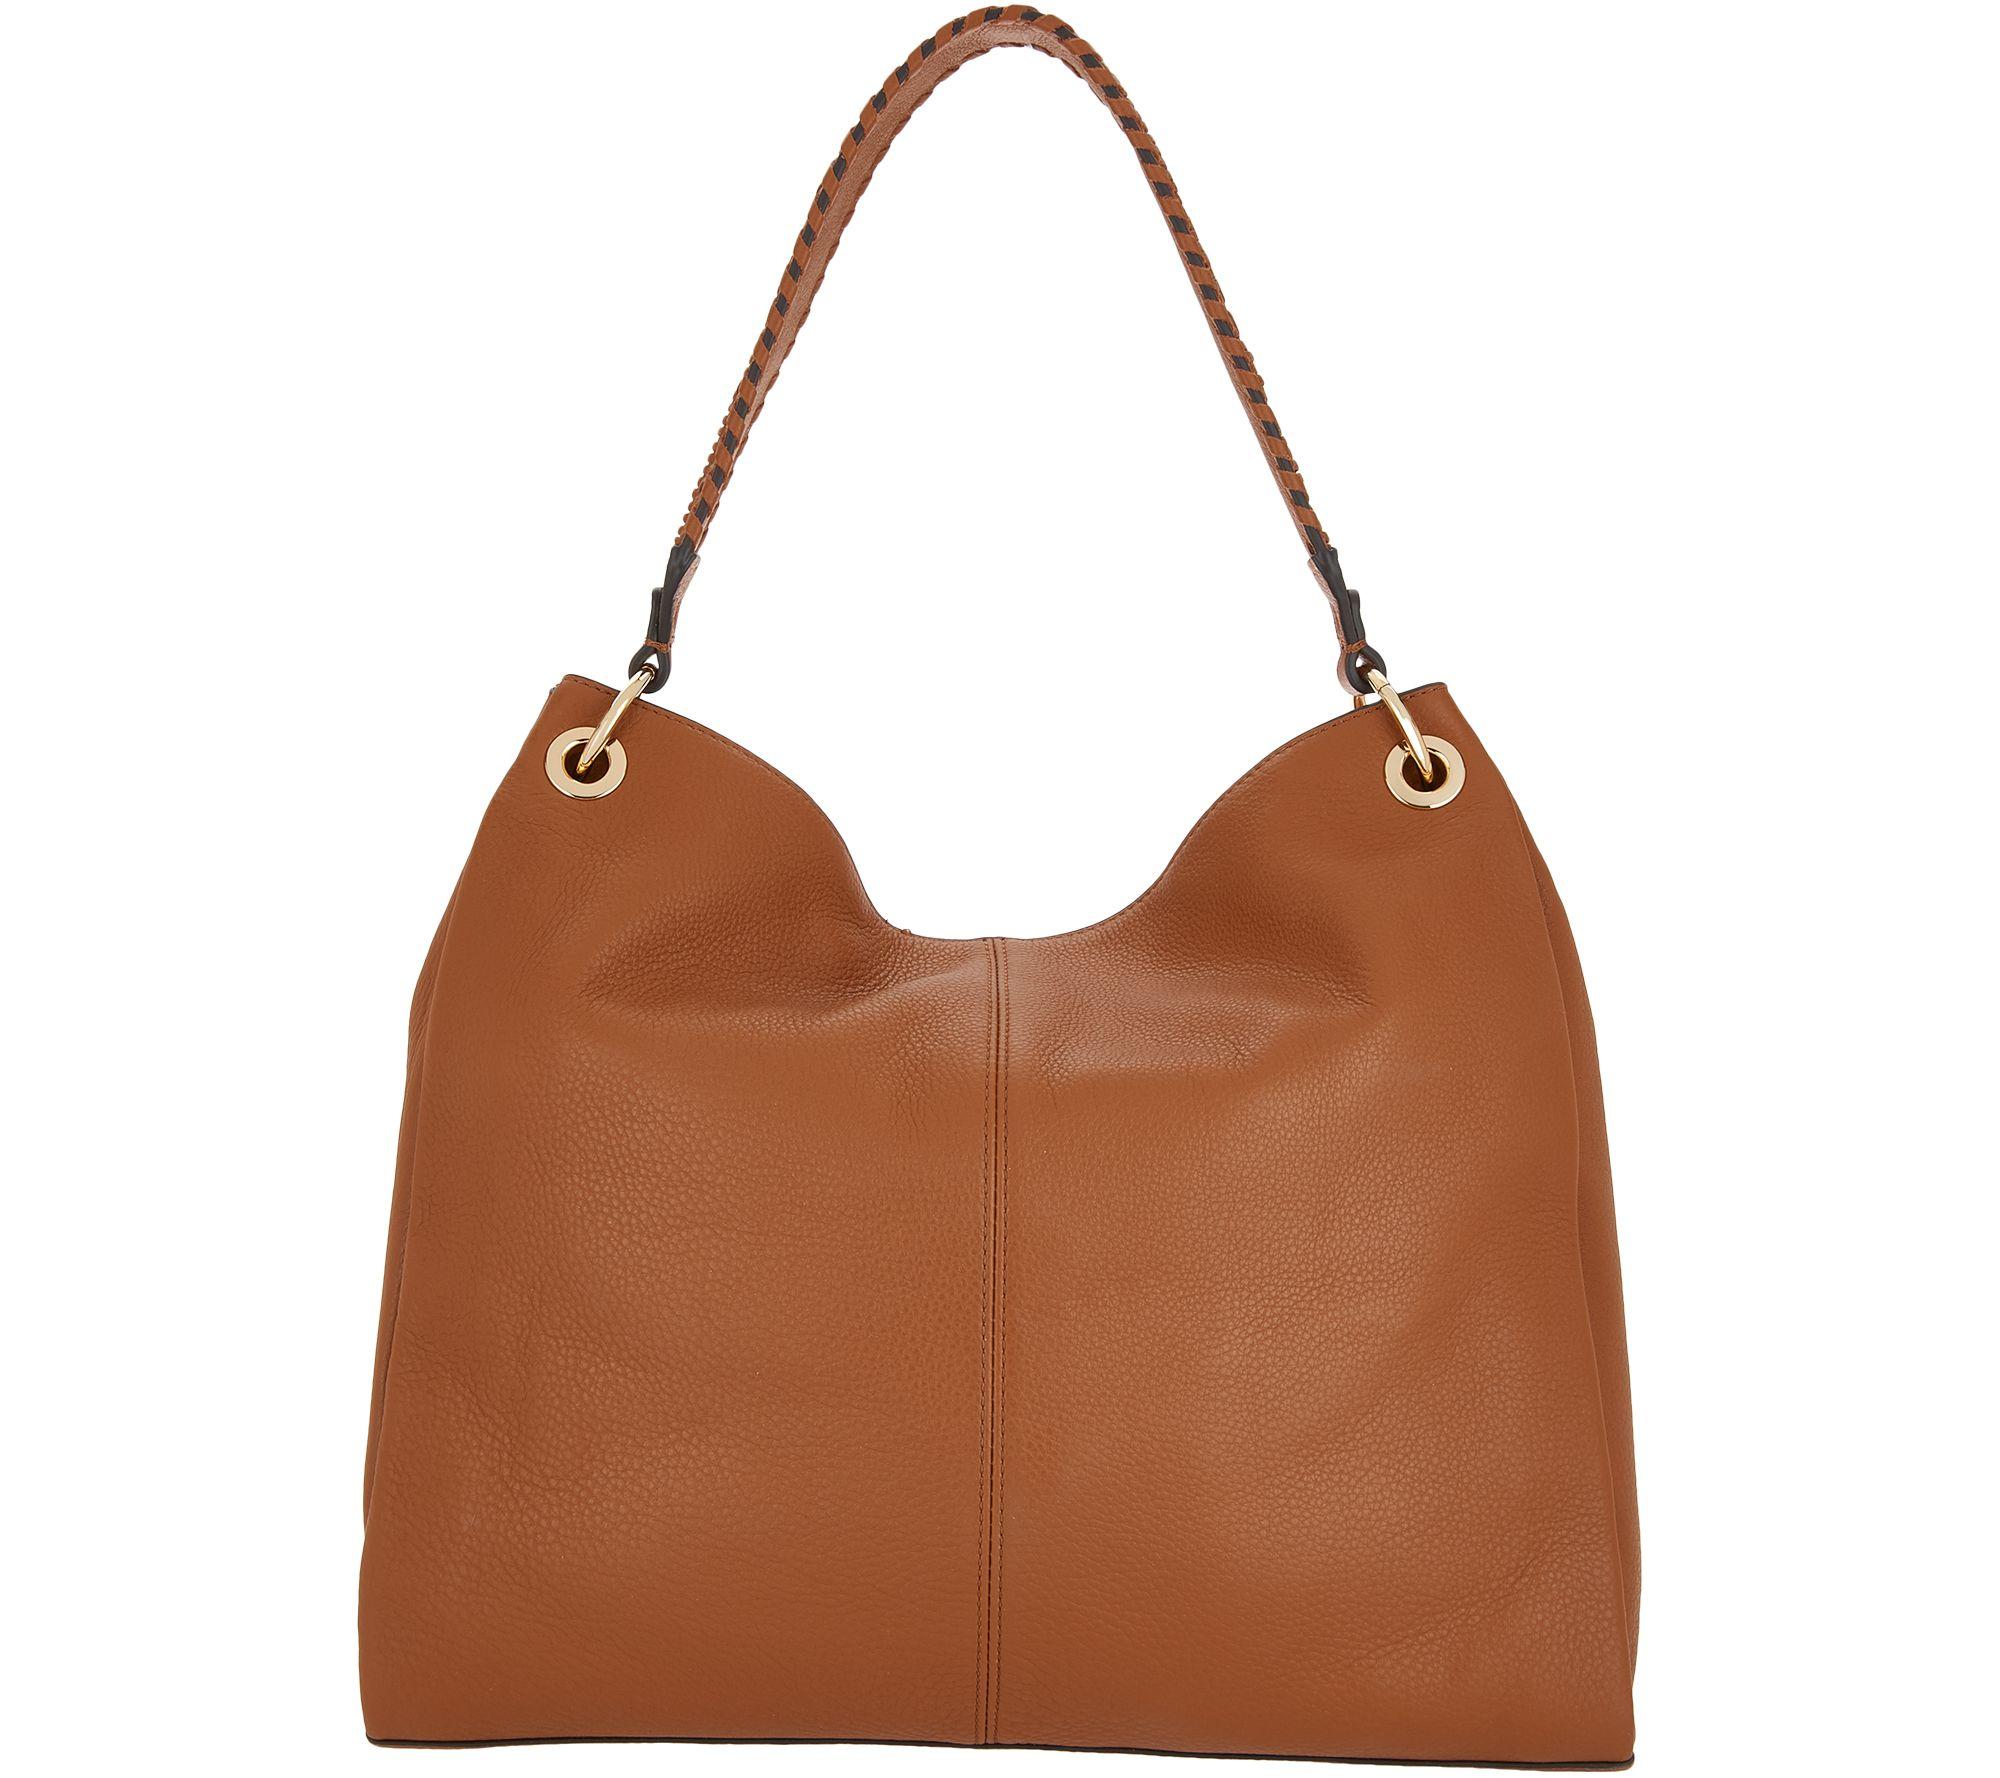 55dbd6c15e Vince Camuto Leather Hobo Handbag - Nadja - Page 1 — QVC.com